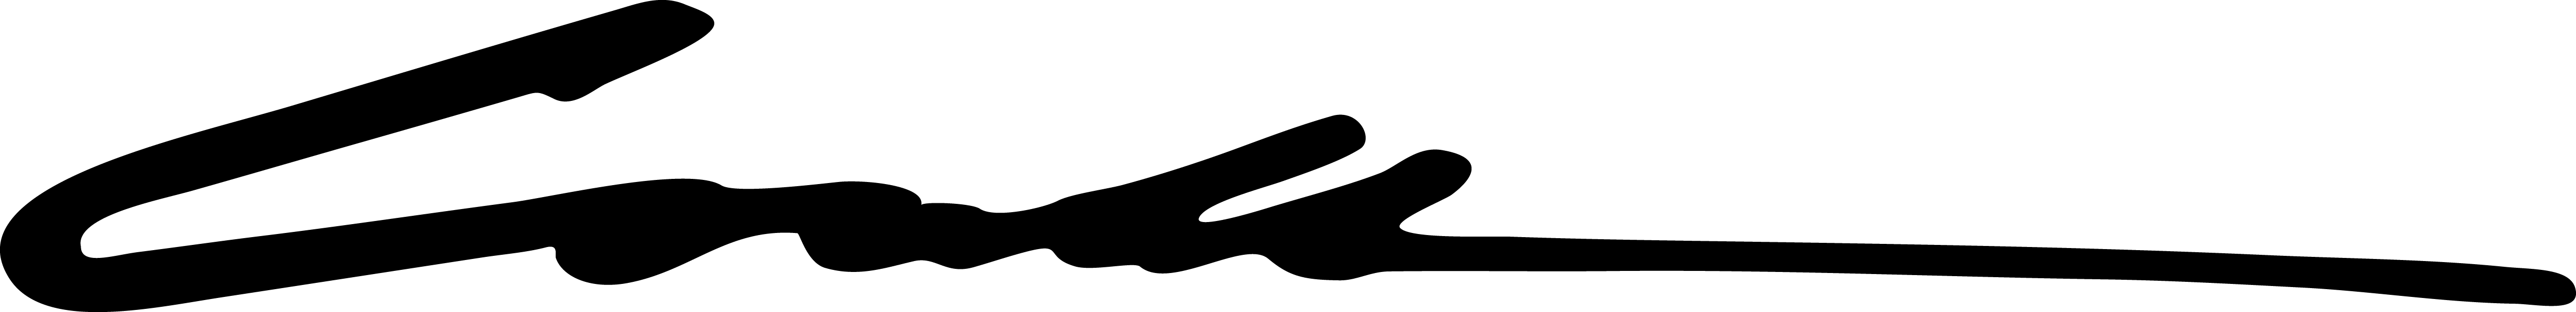 CINDY CONKLIN's Signature